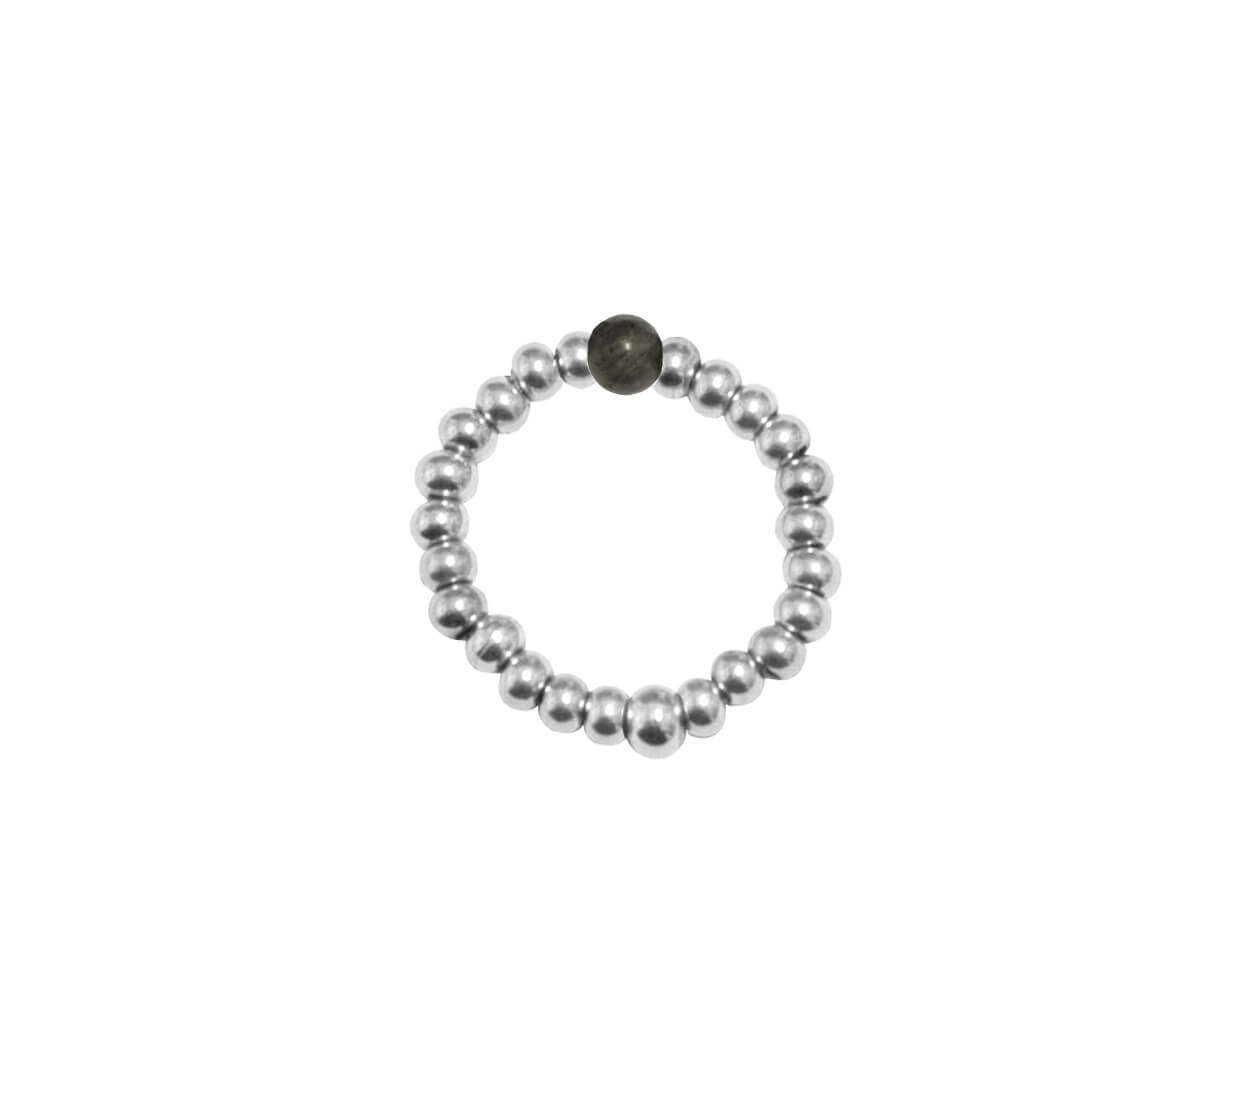 Mas Jewelz Ring 3 mm Larvikite Model 2 Silver